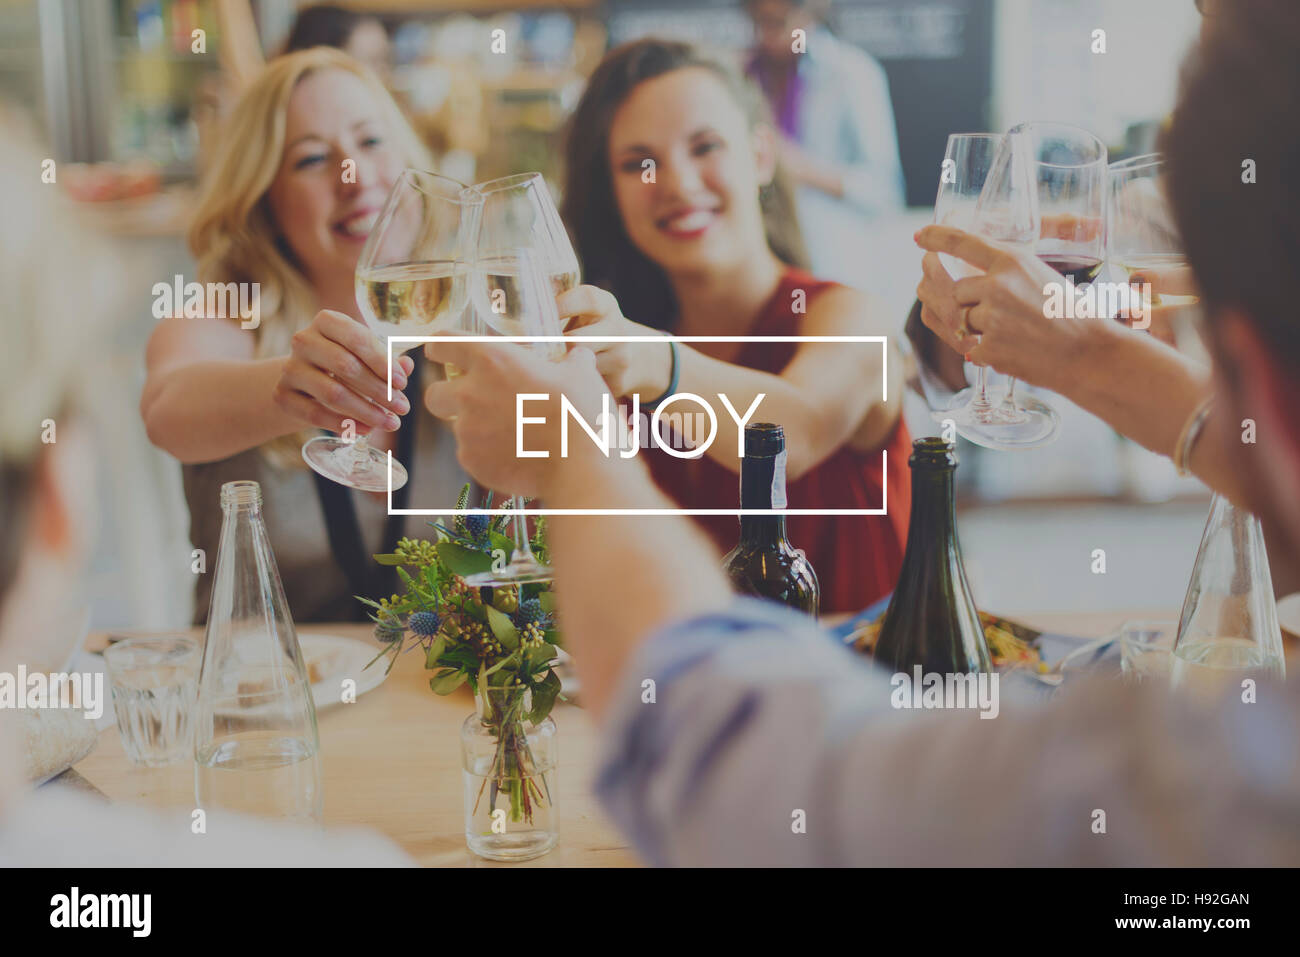 Enjoy Enjoyment Happiness Life Joy Concept - Stock Image